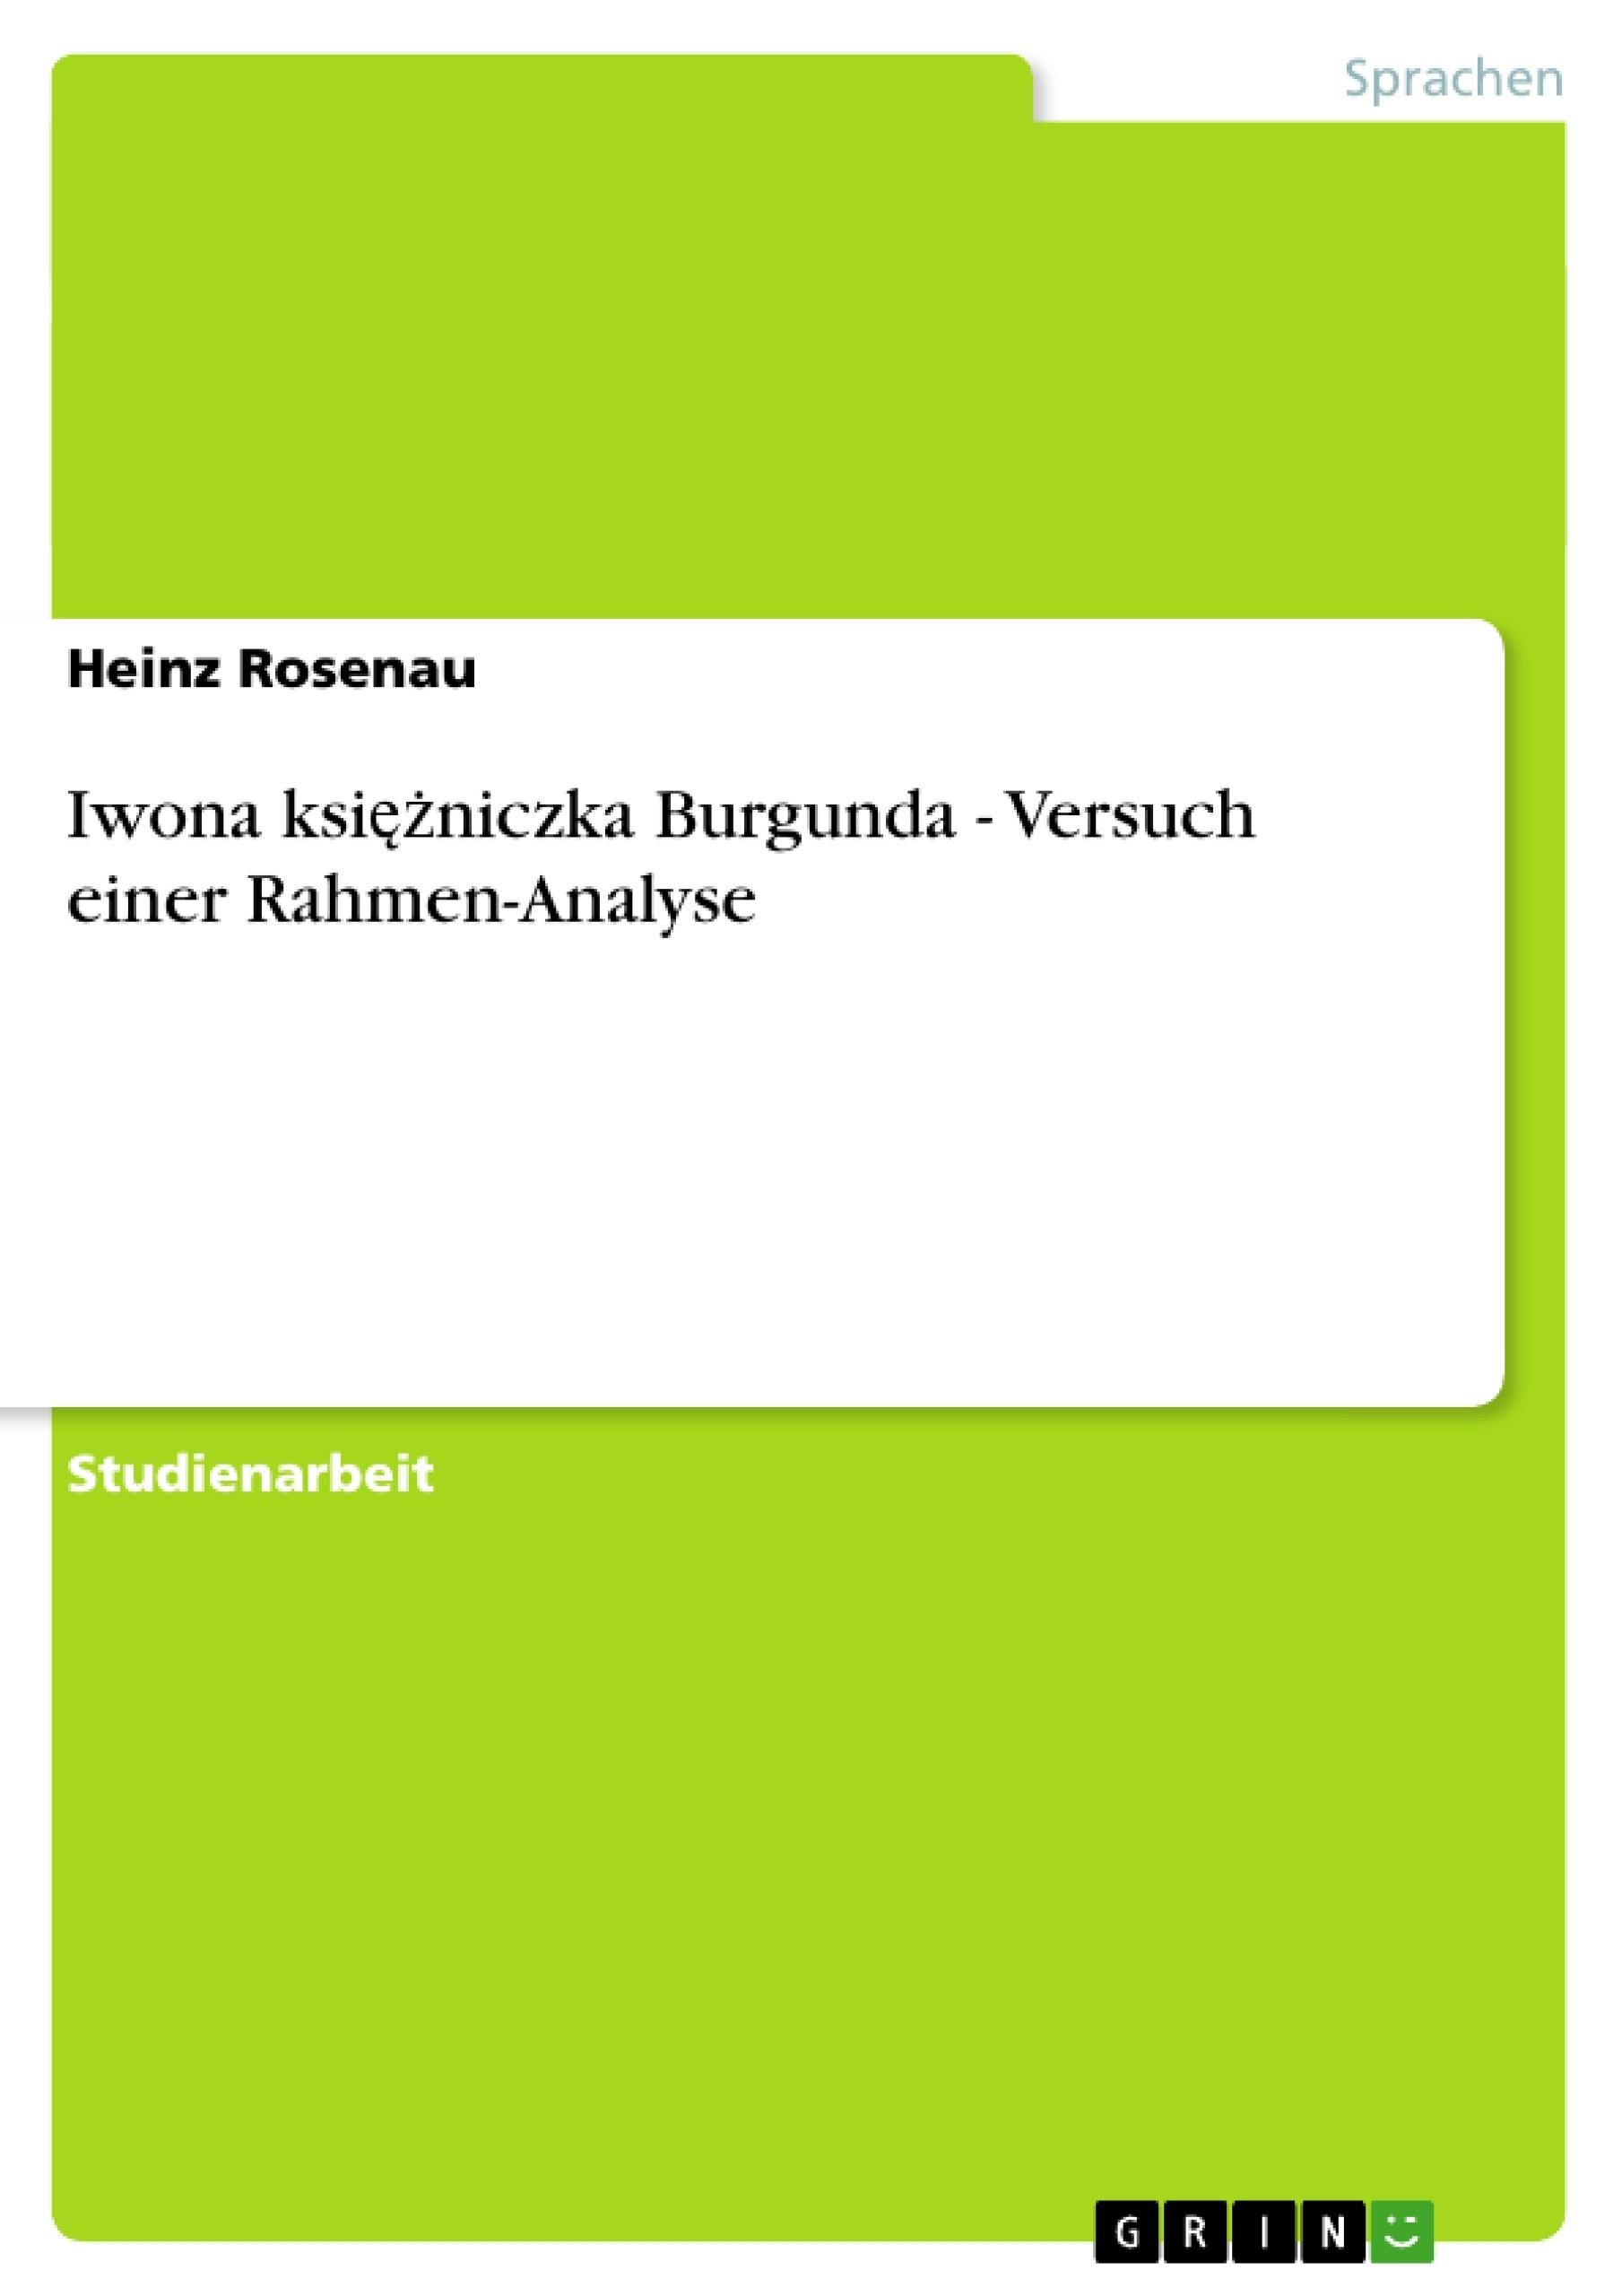 Iwona księżniczka Burgunda - Versuch einer Rahmen-Analyse ...